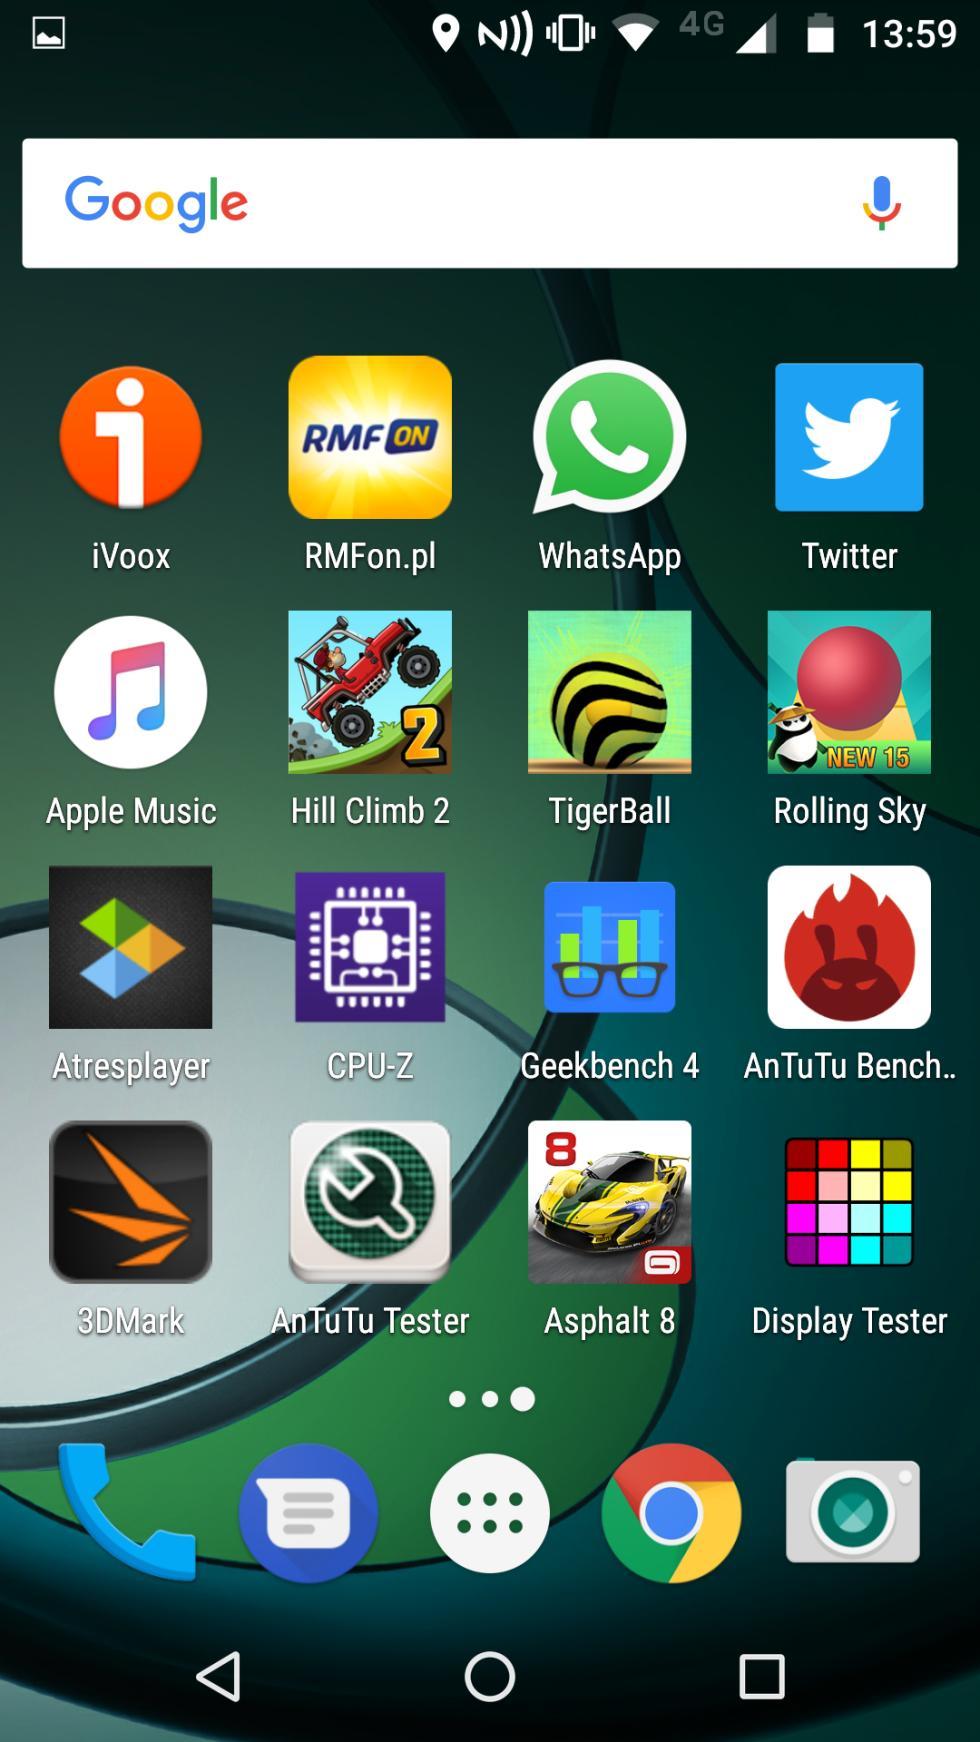 La pantalla que aparece a la derecha de la pantalla principal del móvil